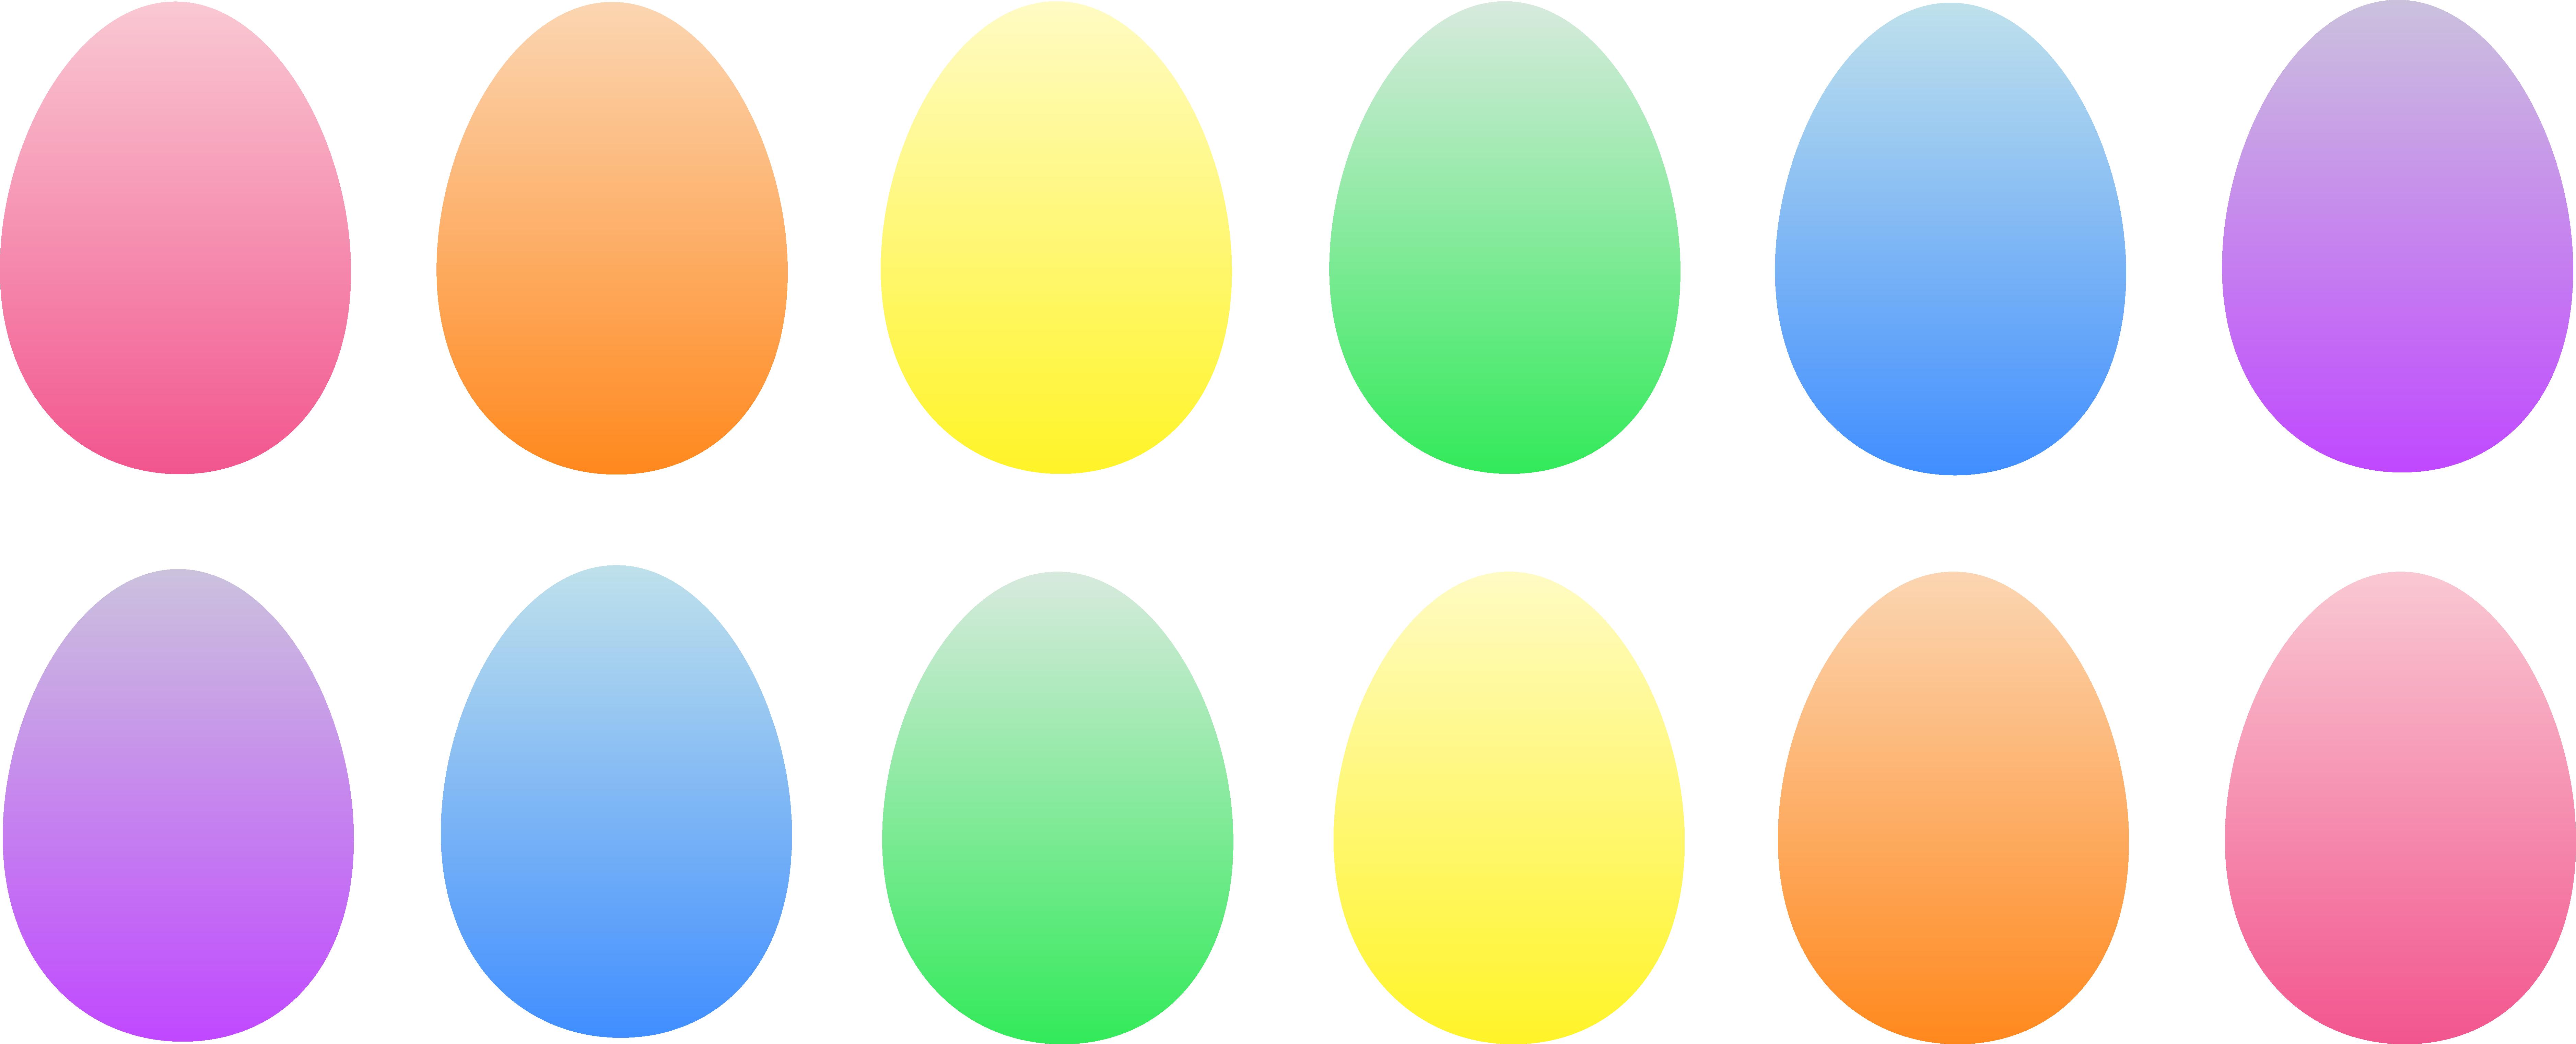 Easter egg border clipart clip black and white Easter egg border clipart free images 4 | Easter & Spring Seasons ... clip black and white